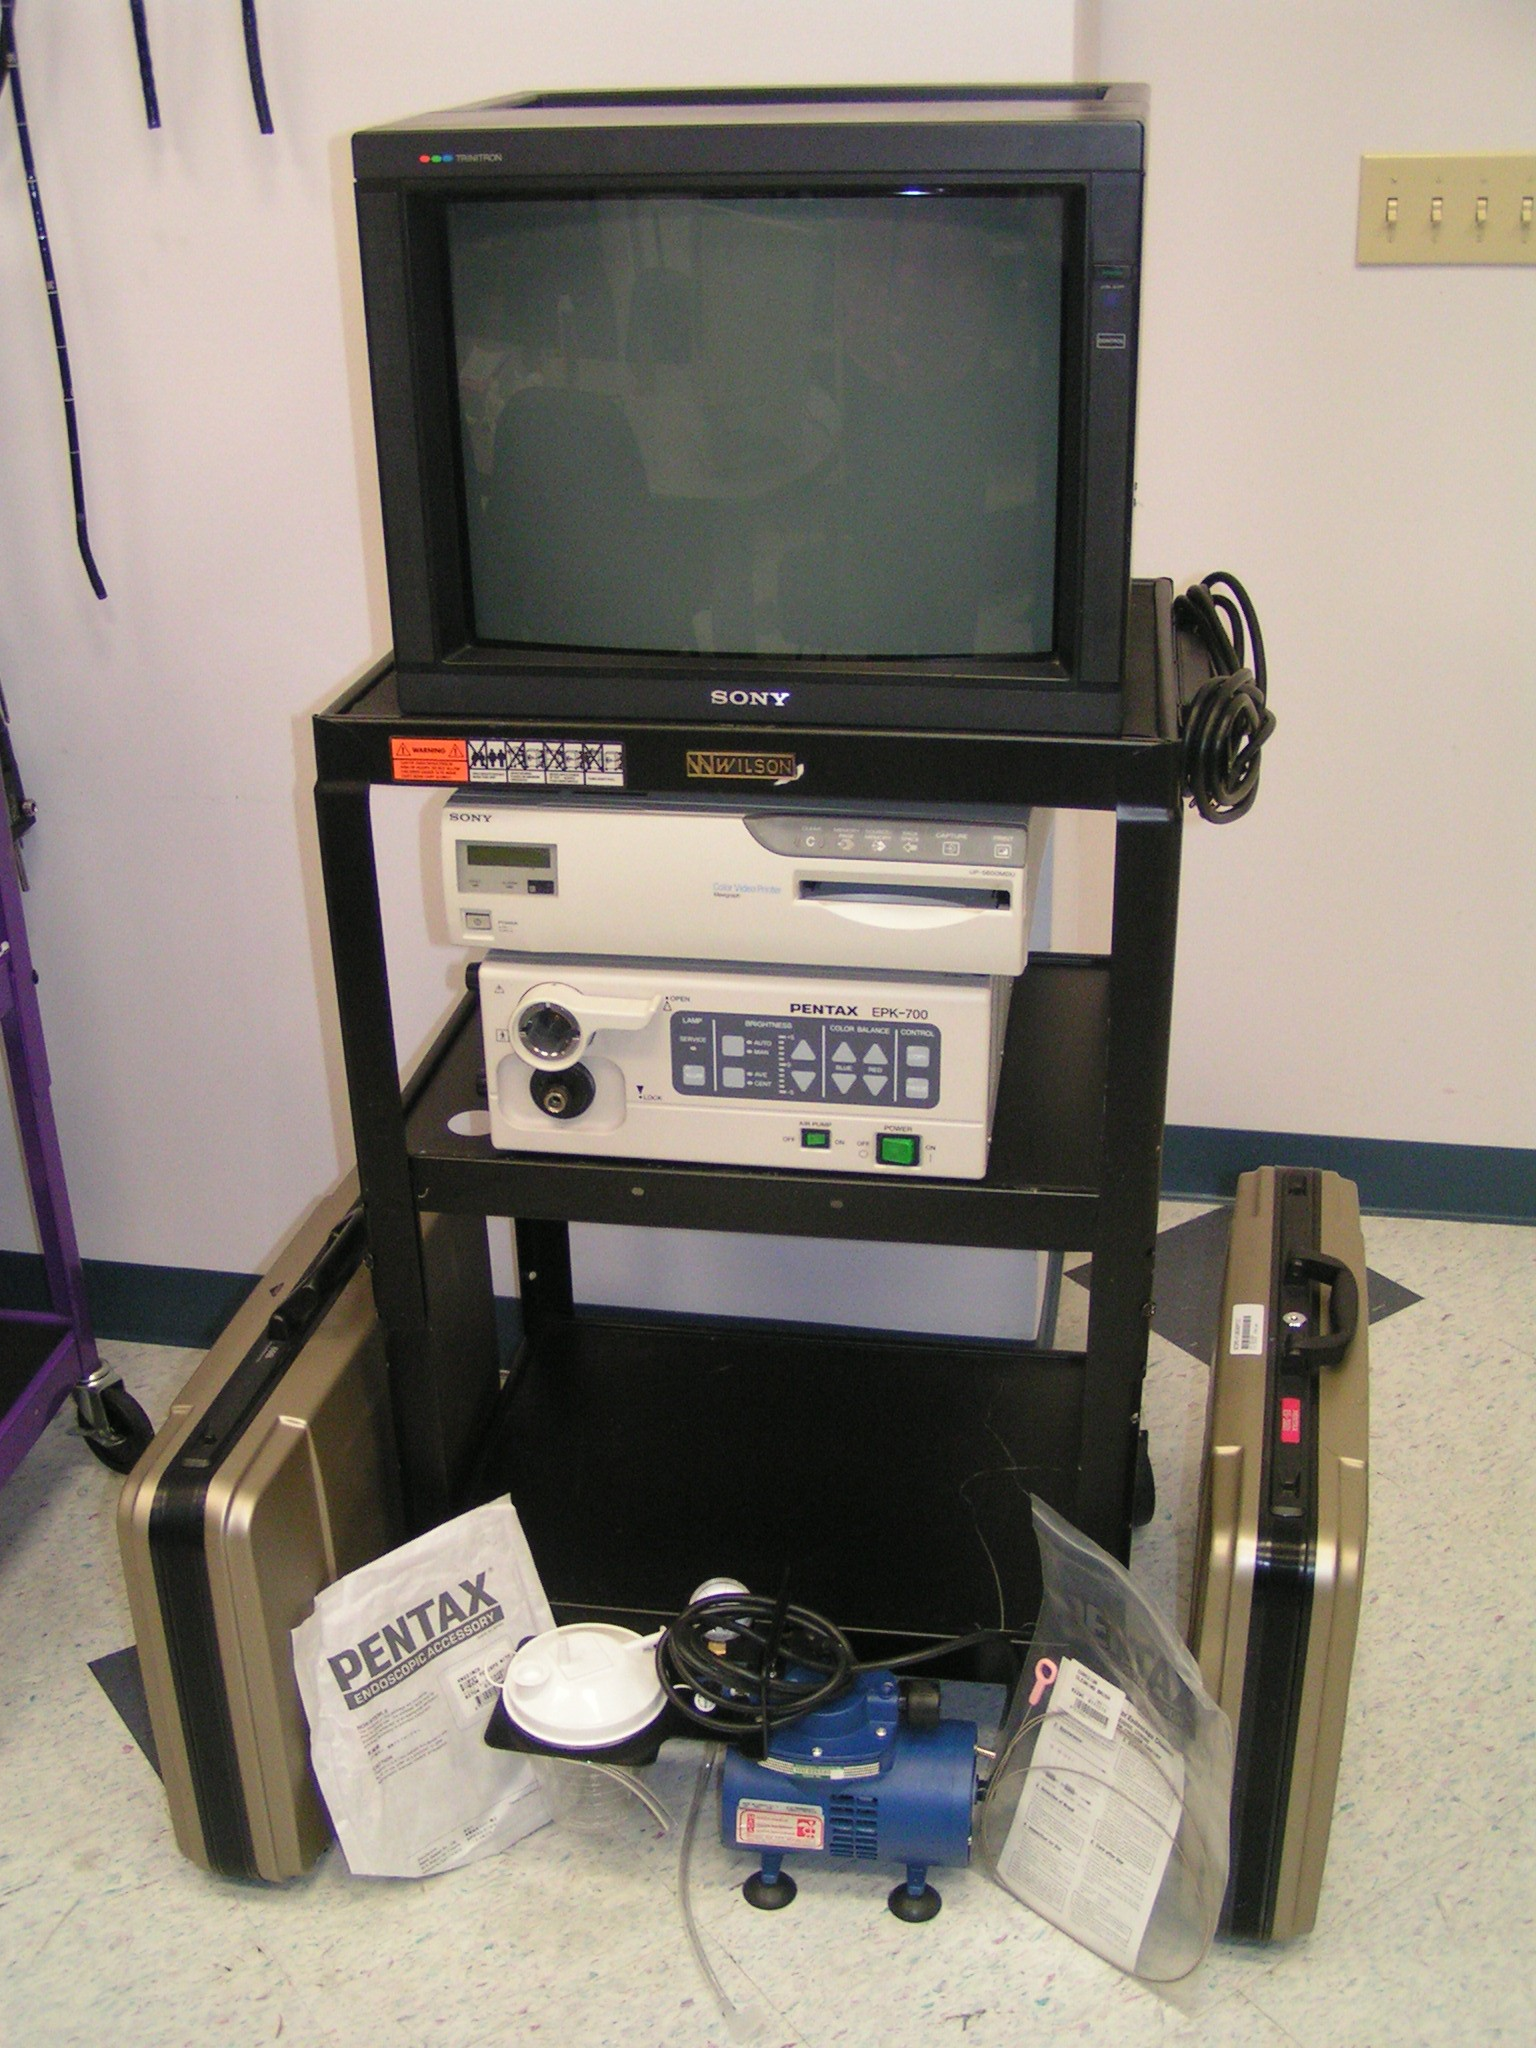 Printable Endoscopy: Olympus CV-100 Endoscopy System